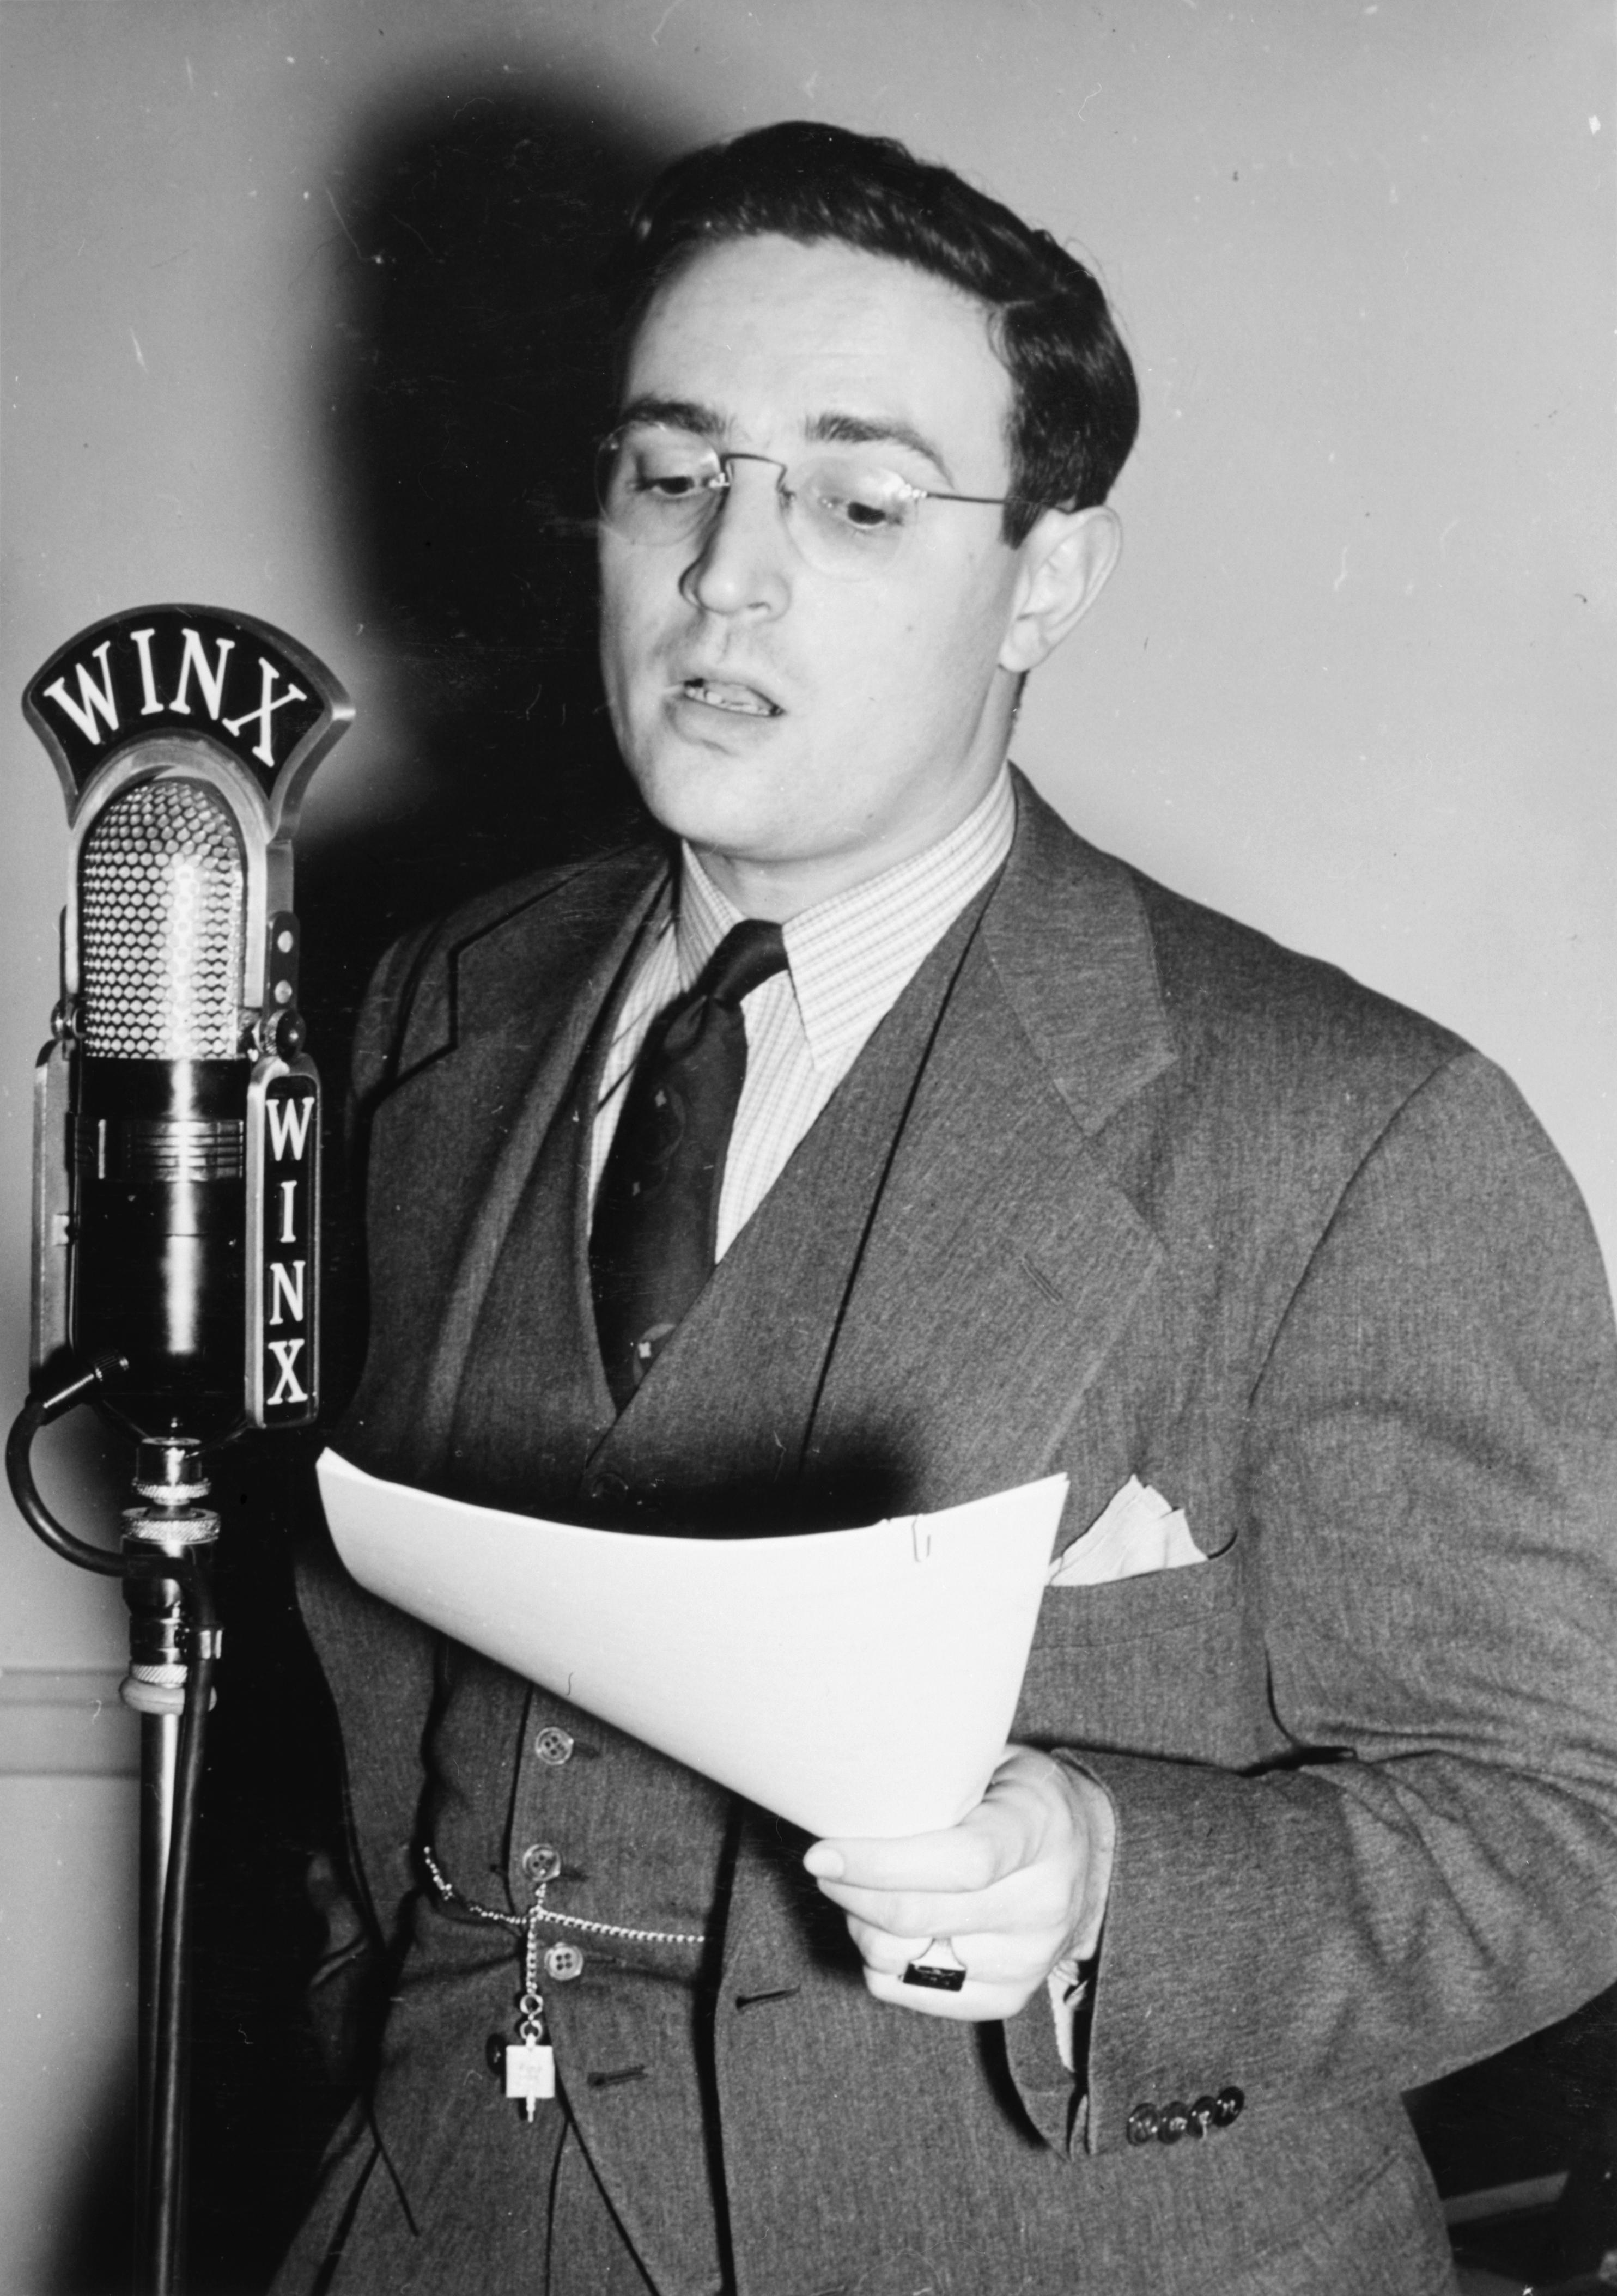 Image of William Paul Gottlieb from Wikidata